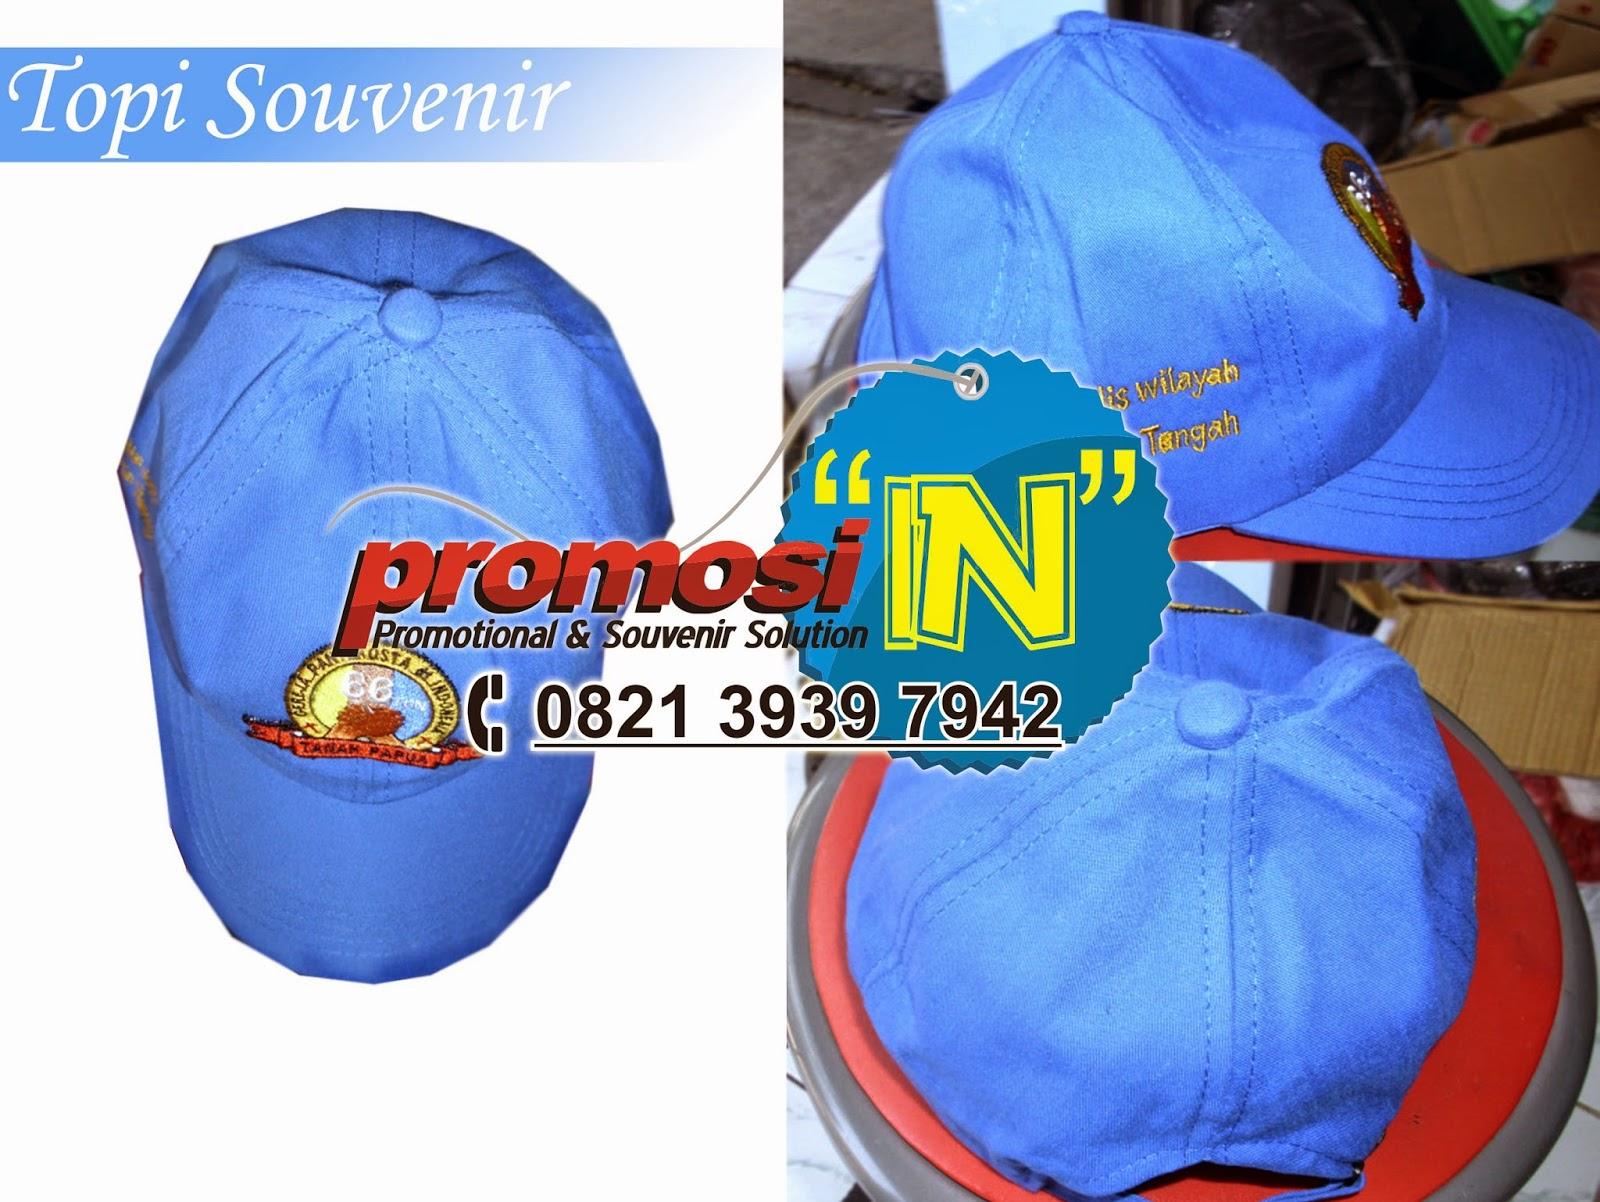 Topi, Topi Online, Topi Surabaya, Topi Lusinan, Pusat Topi Surabaya